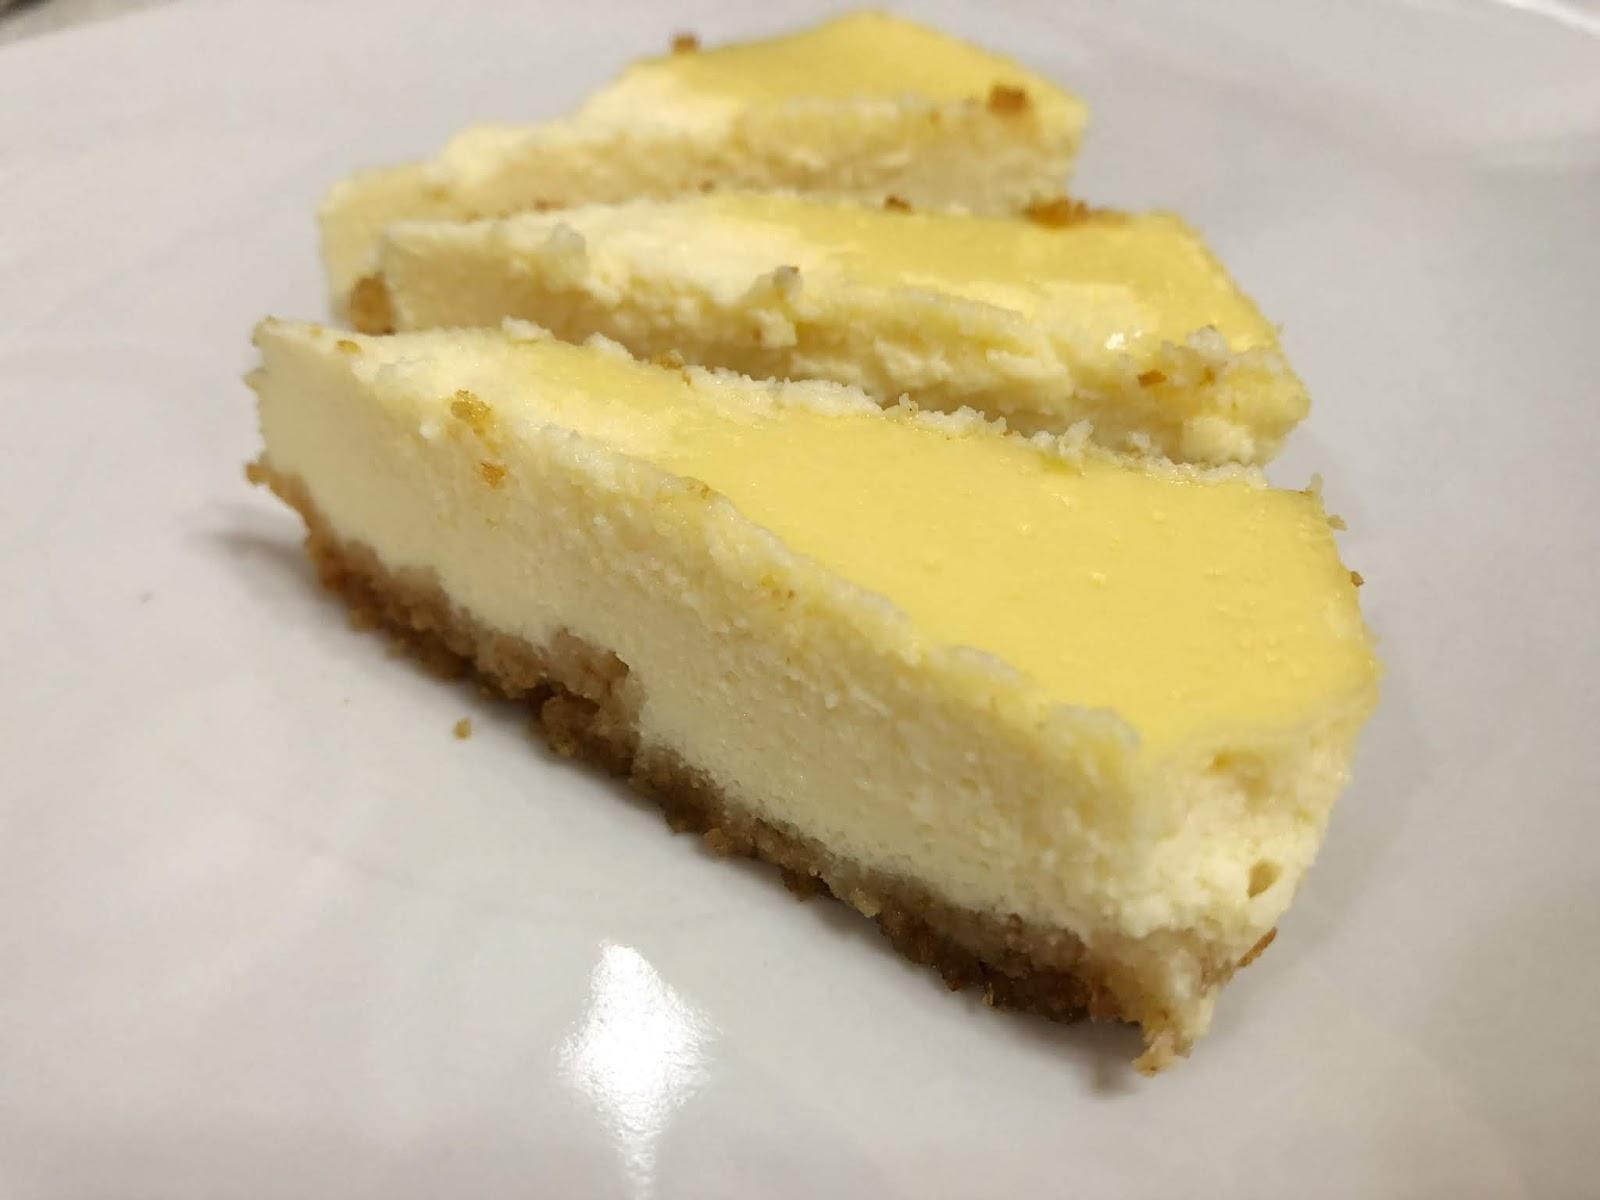 Resepi Cheese Cake Simple Iman Abdul Rahim